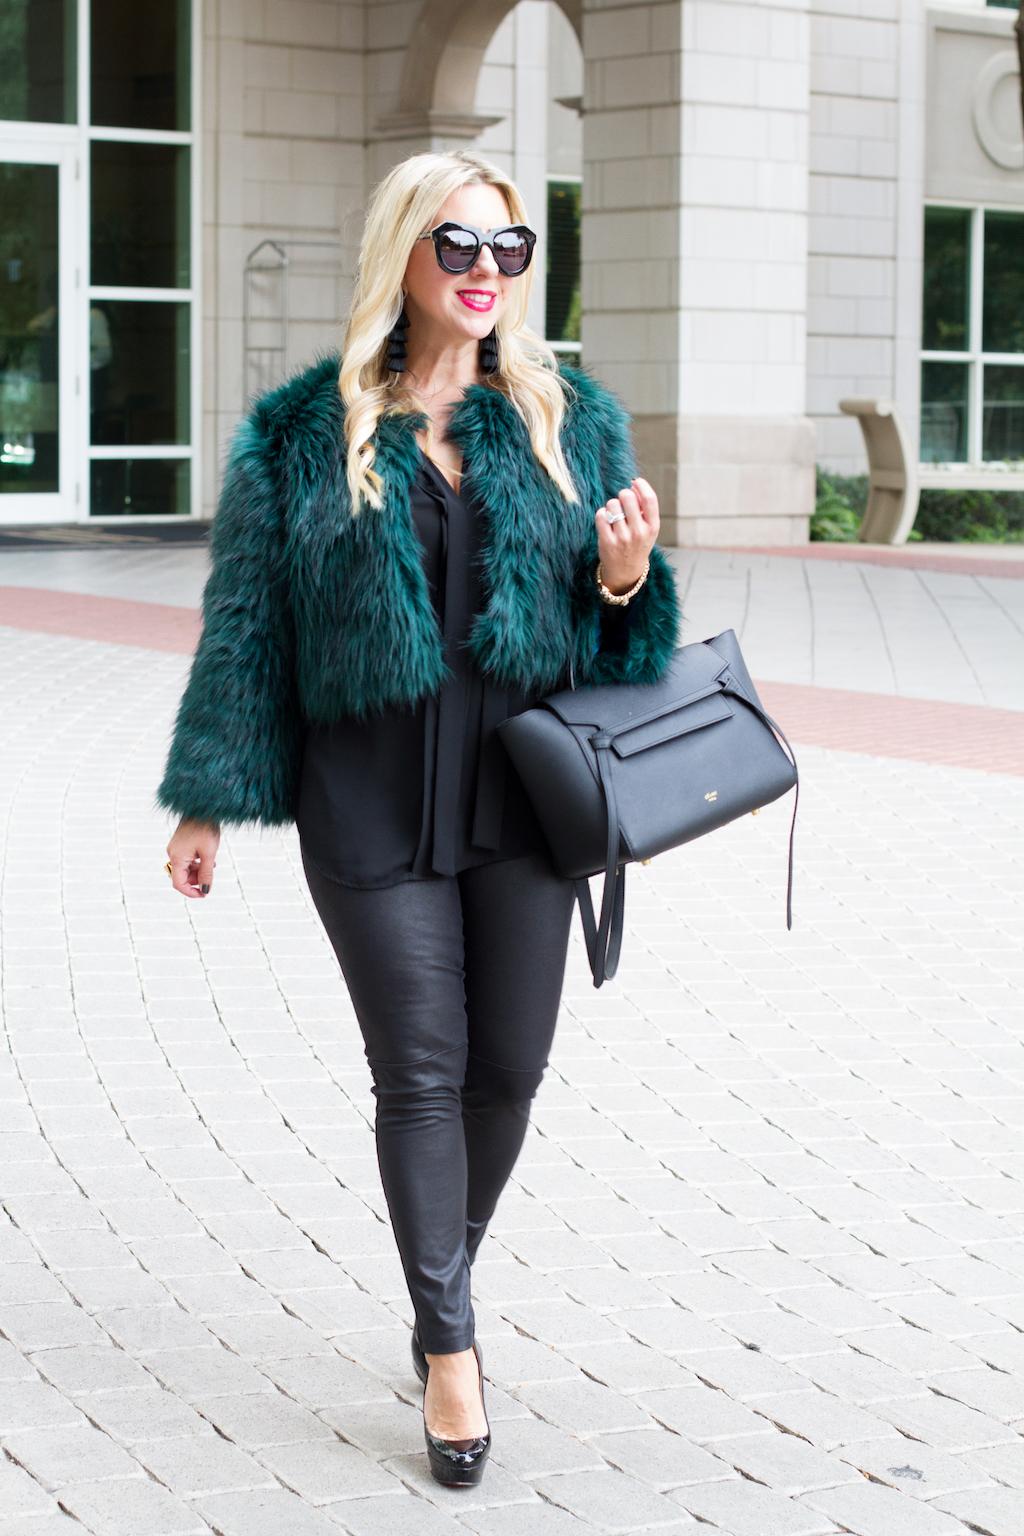 5 Faux Fur Coats For The Winter | The Darling Petite Diva | Winter Coat